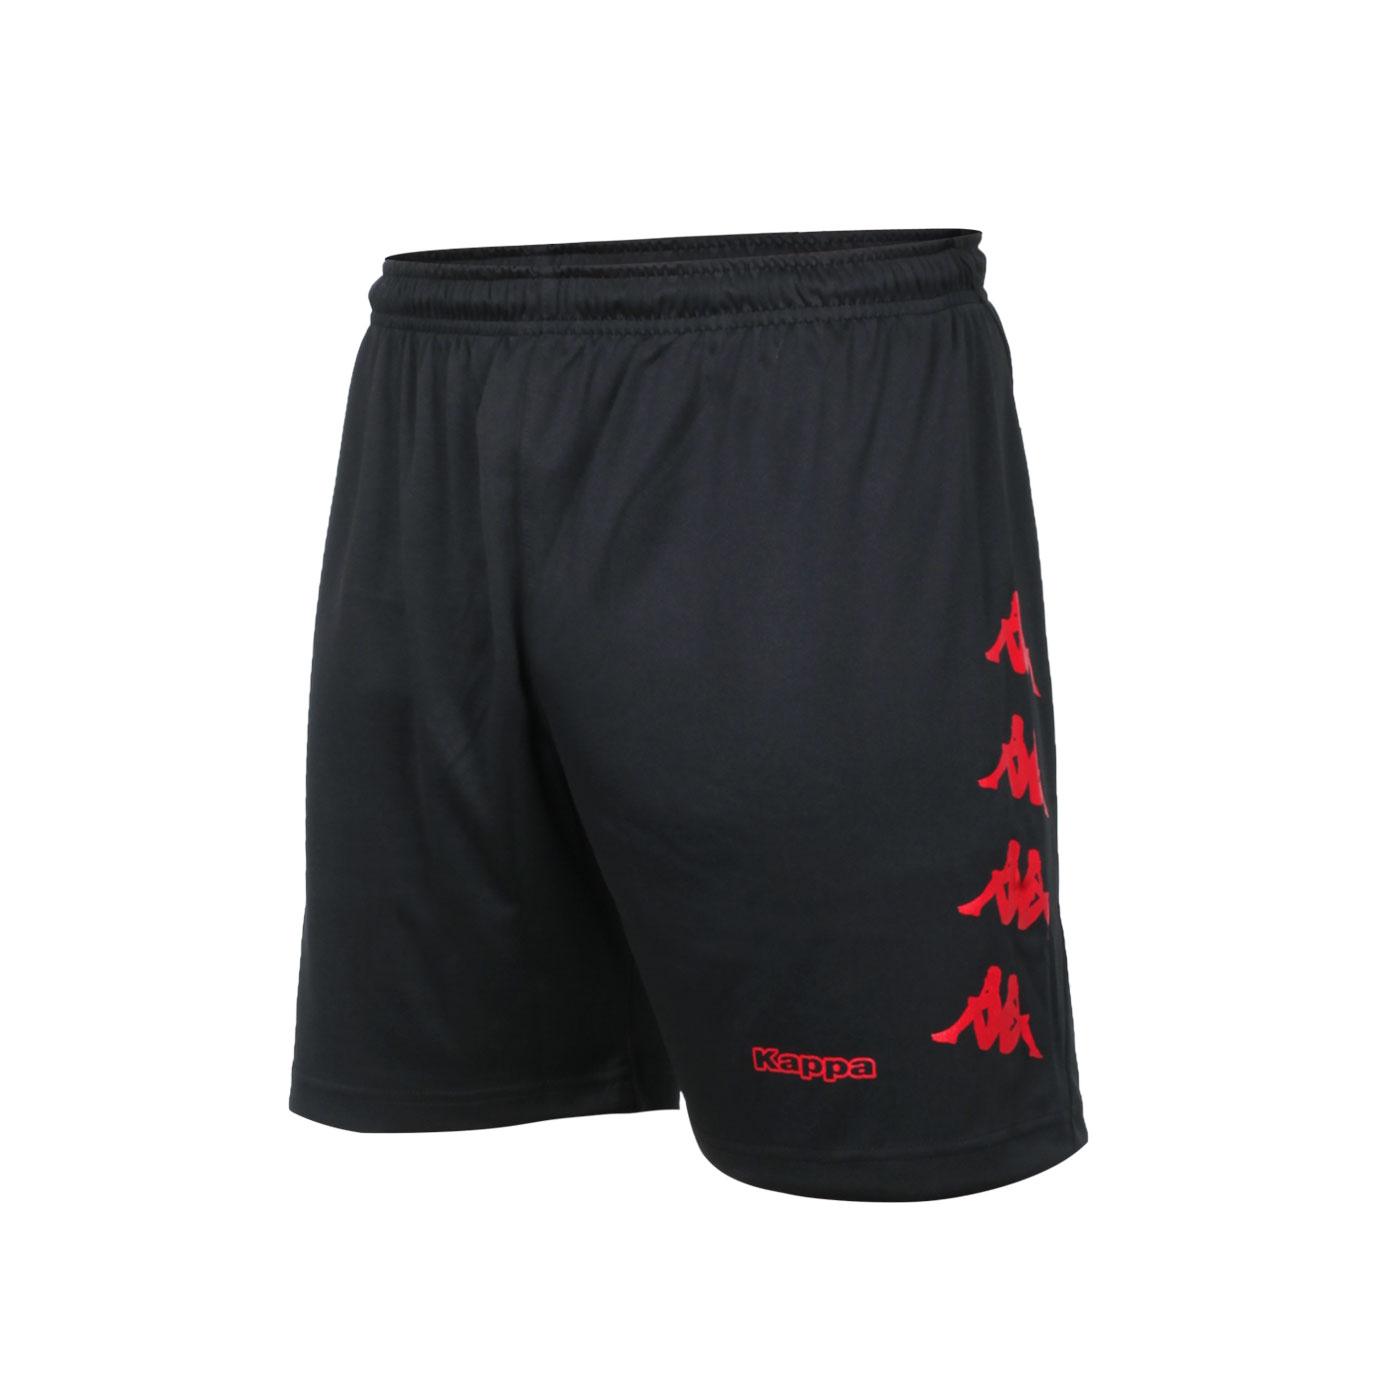 KAPPA 男款K4T針織短褲 32166YW-D18 - 黑紅